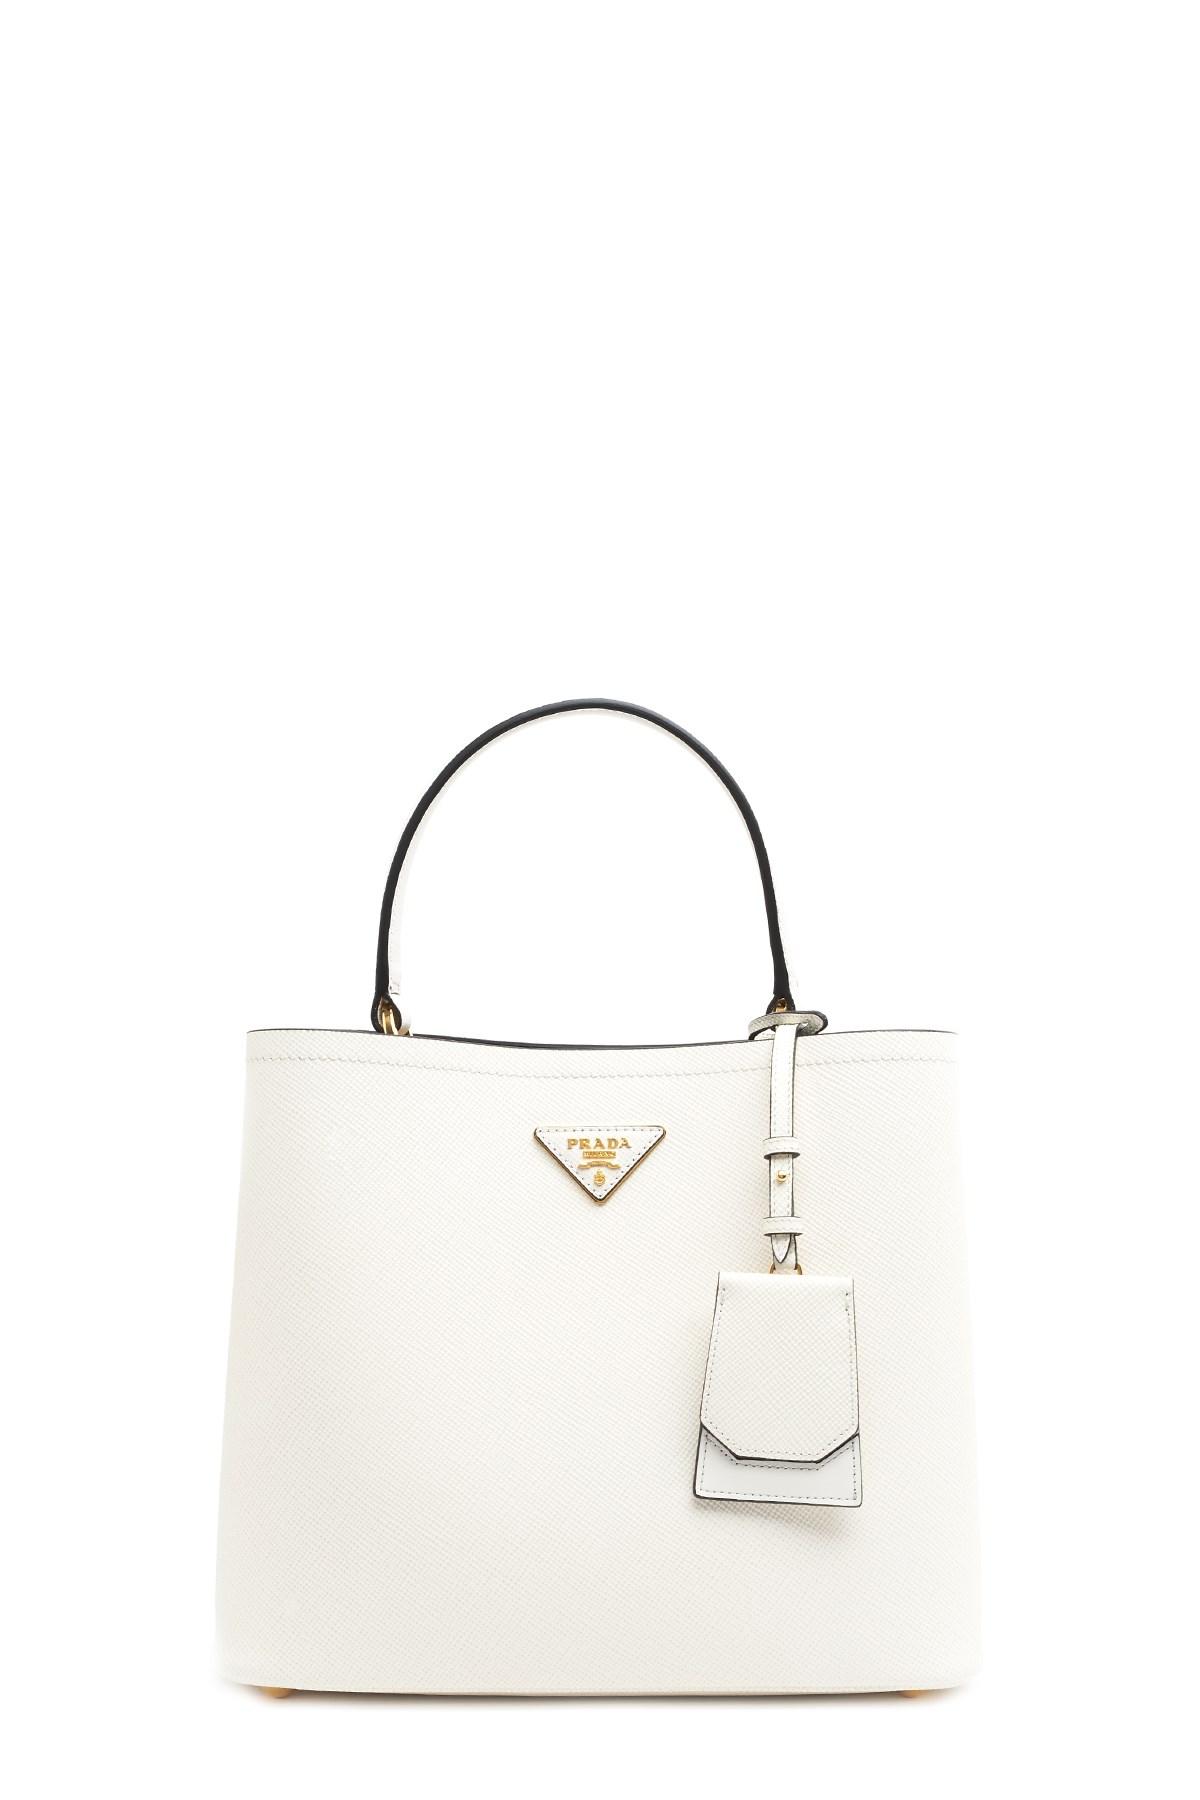 2dea56d239fc prada 'Double' hand bag available on julian-fashion.com - 64271